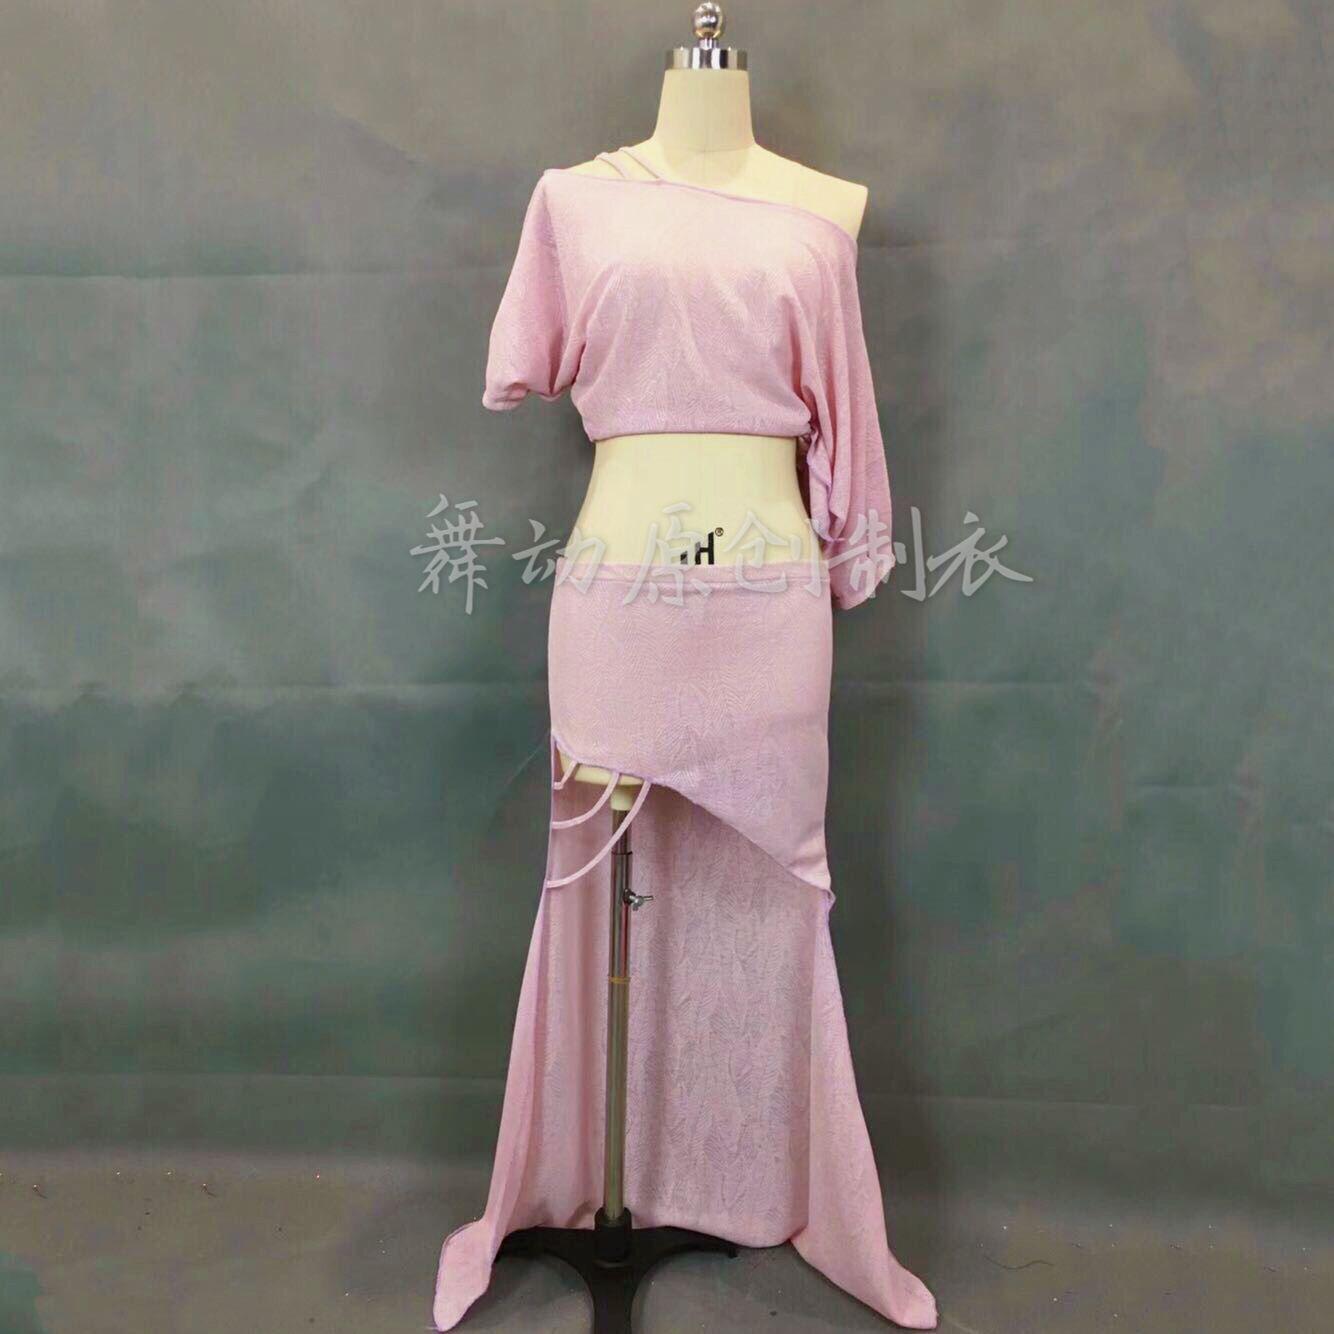 Bellydance oriental Belly baladi Indian eastern Egyptian hair swinging dance dancing costumes bra belt skirt dress robe set 3241